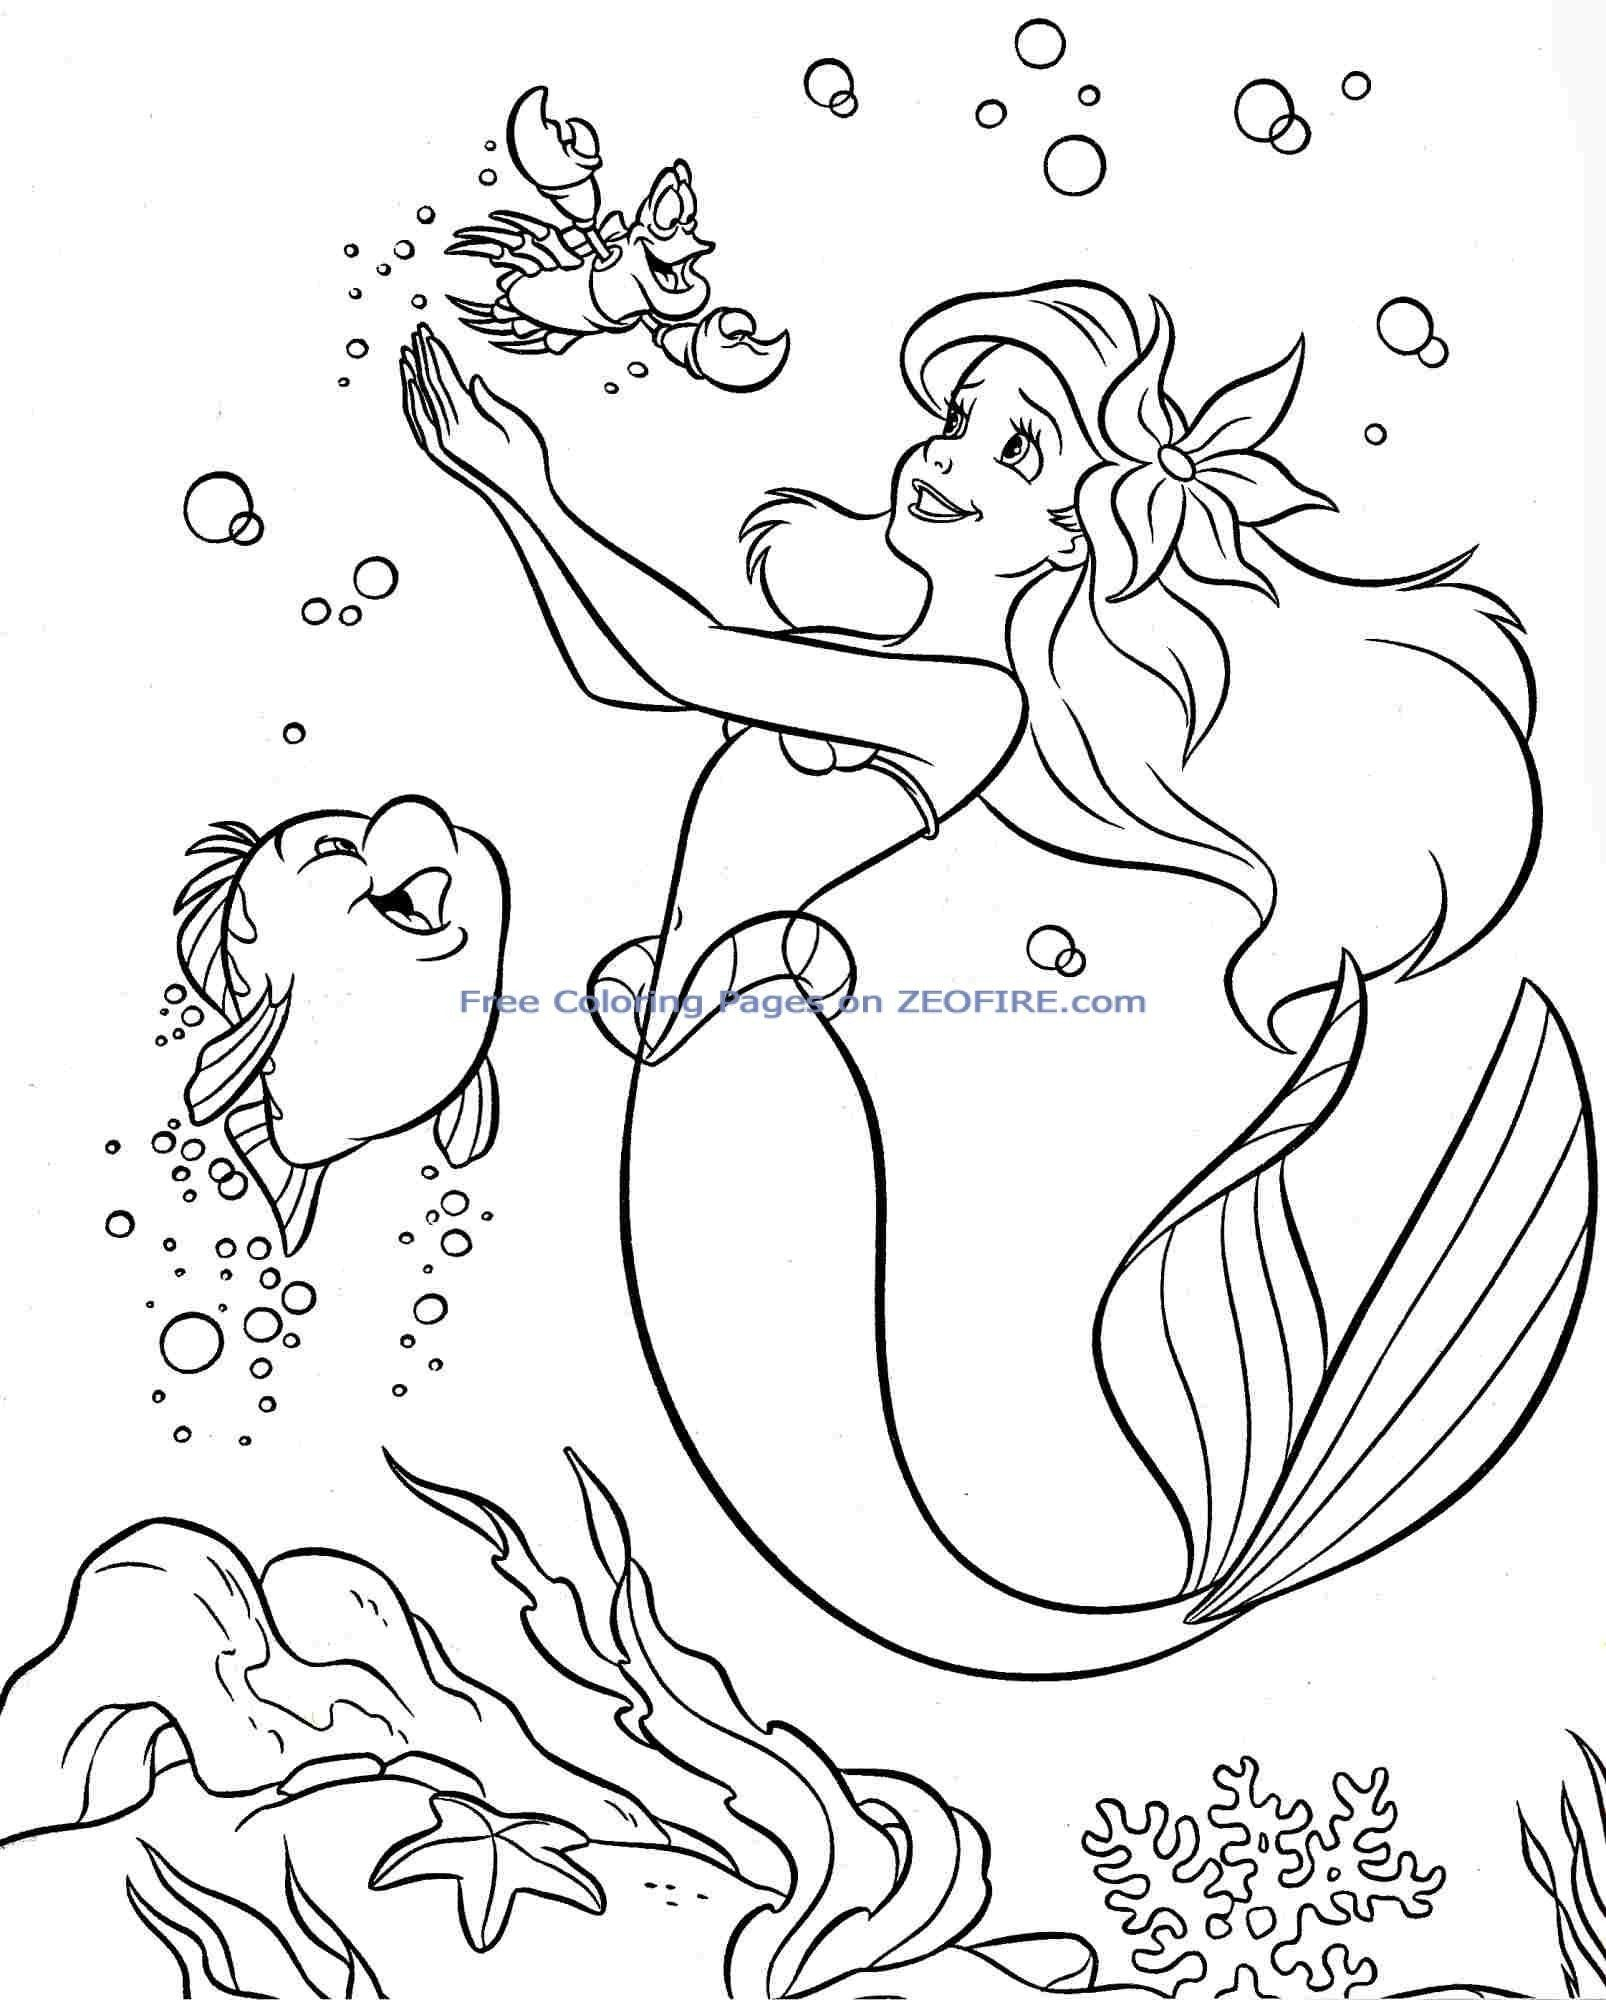 Disney Princess Ariel Coloring Pages Disney Mermaid Coloring Pages Mermaid Pictures To In 2020 Free Disney Coloring Pages Ariel Coloring Pages Princess Coloring Pages